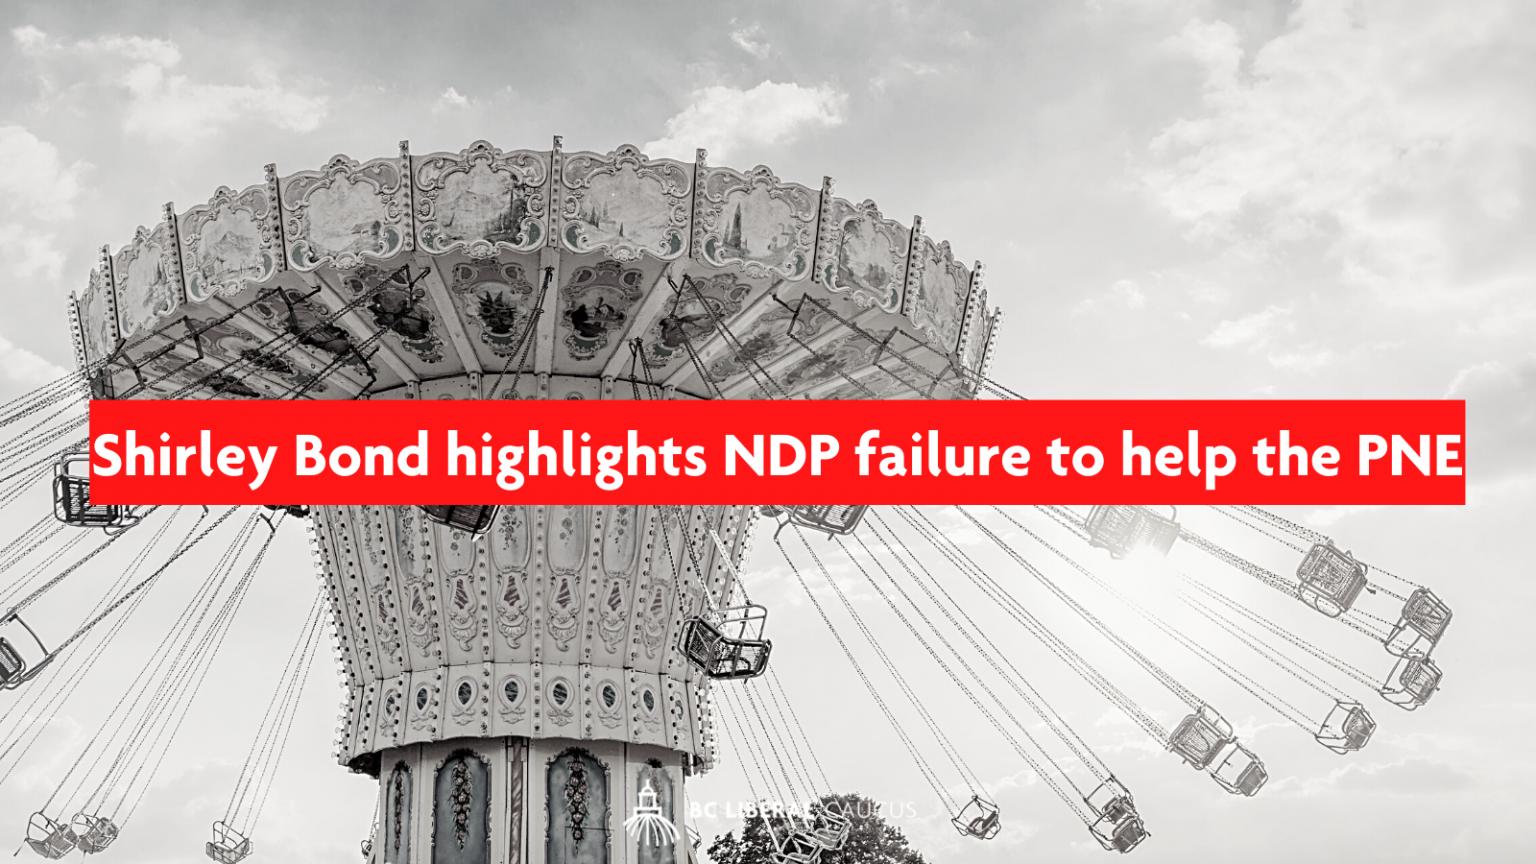 Shirley Bond highlights NDP failure to help the PNE